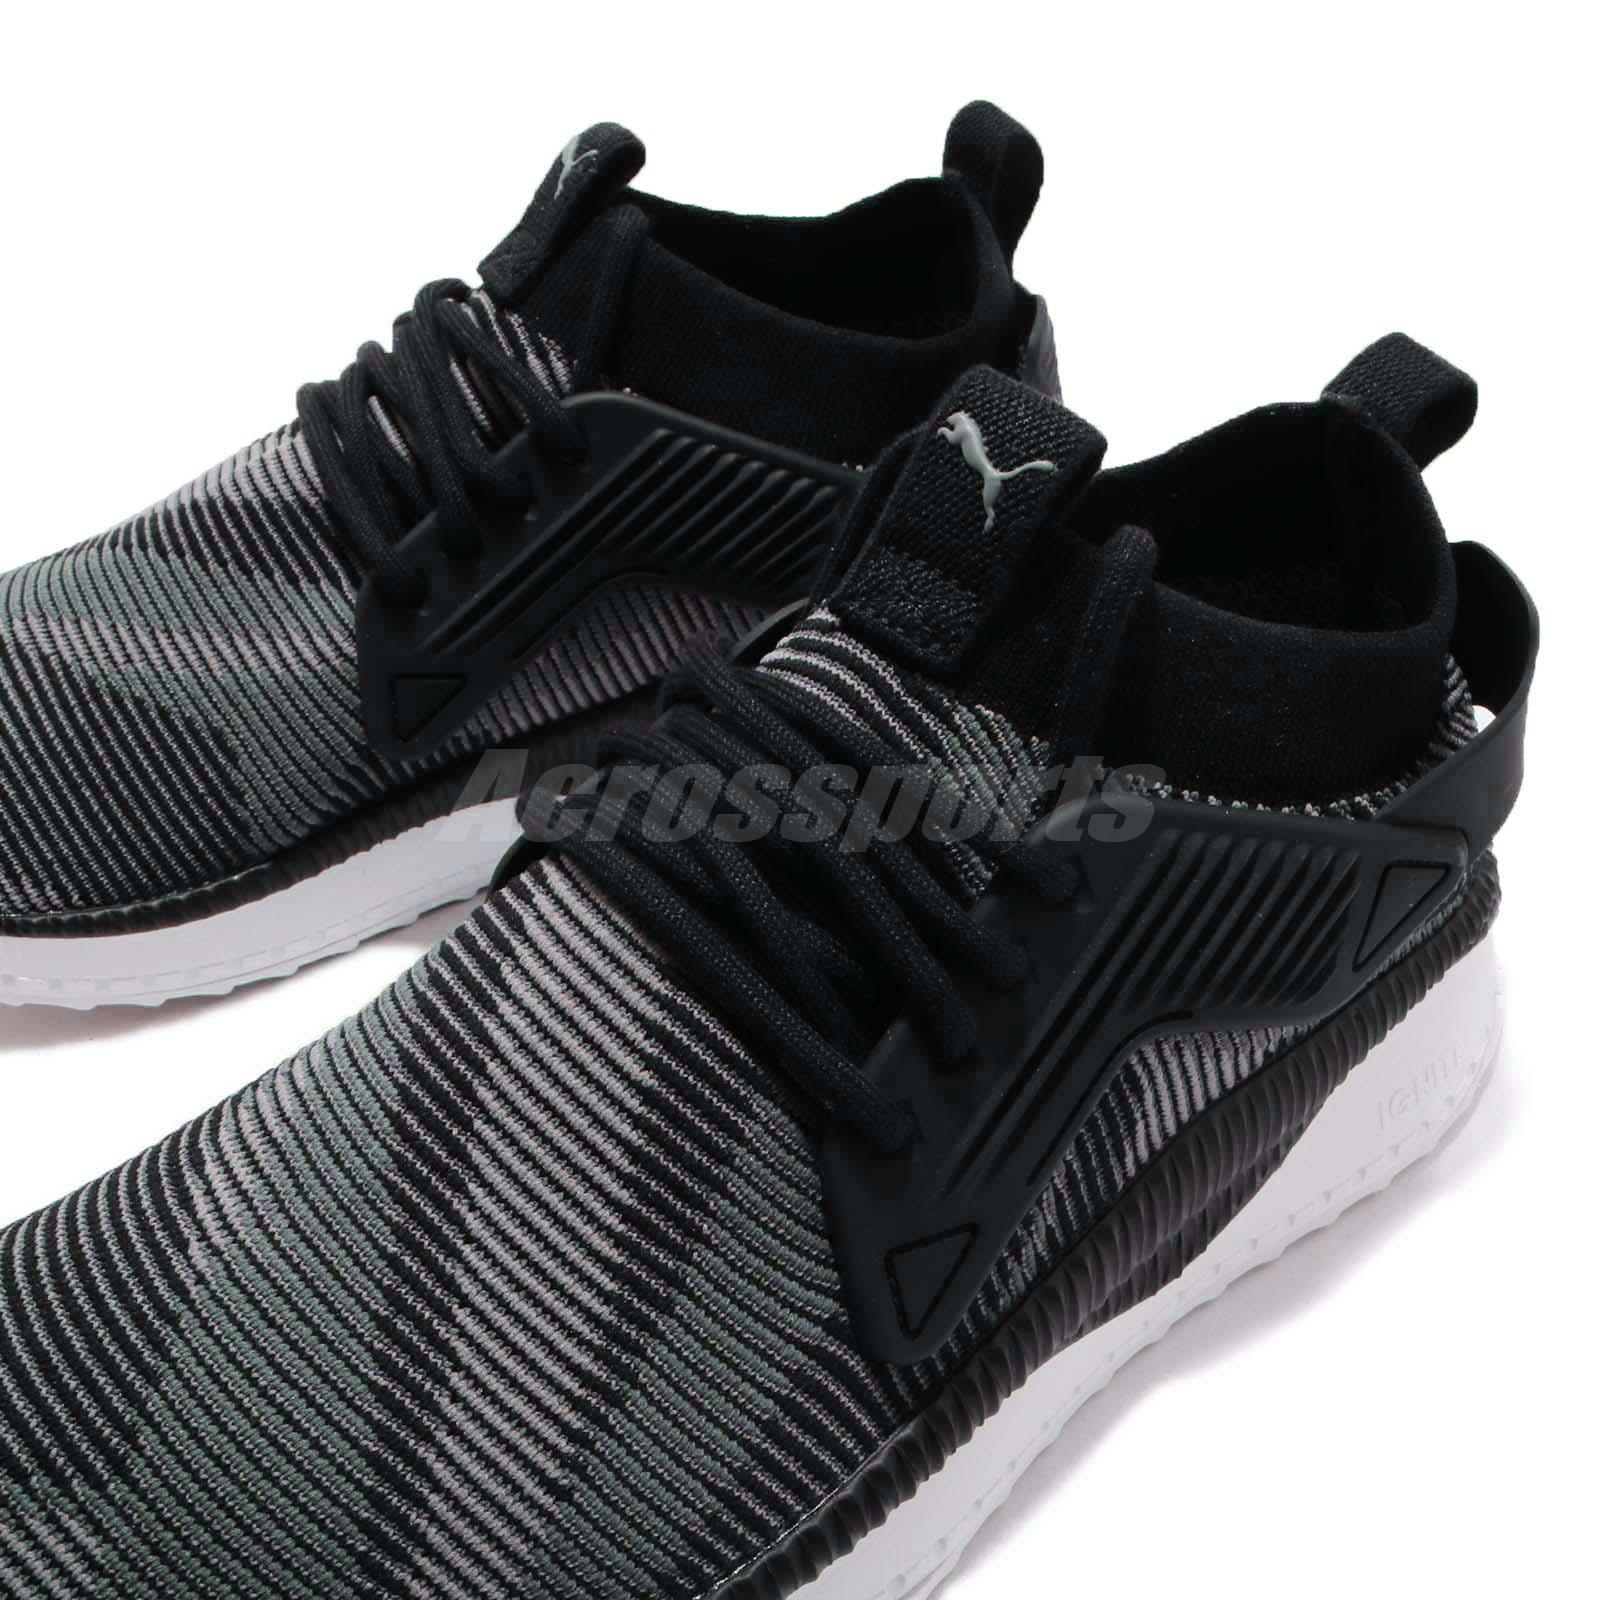 b49753d73763 Puma TSUGI Cage Dazzle Black Grey White Men Women Running Shoe ...